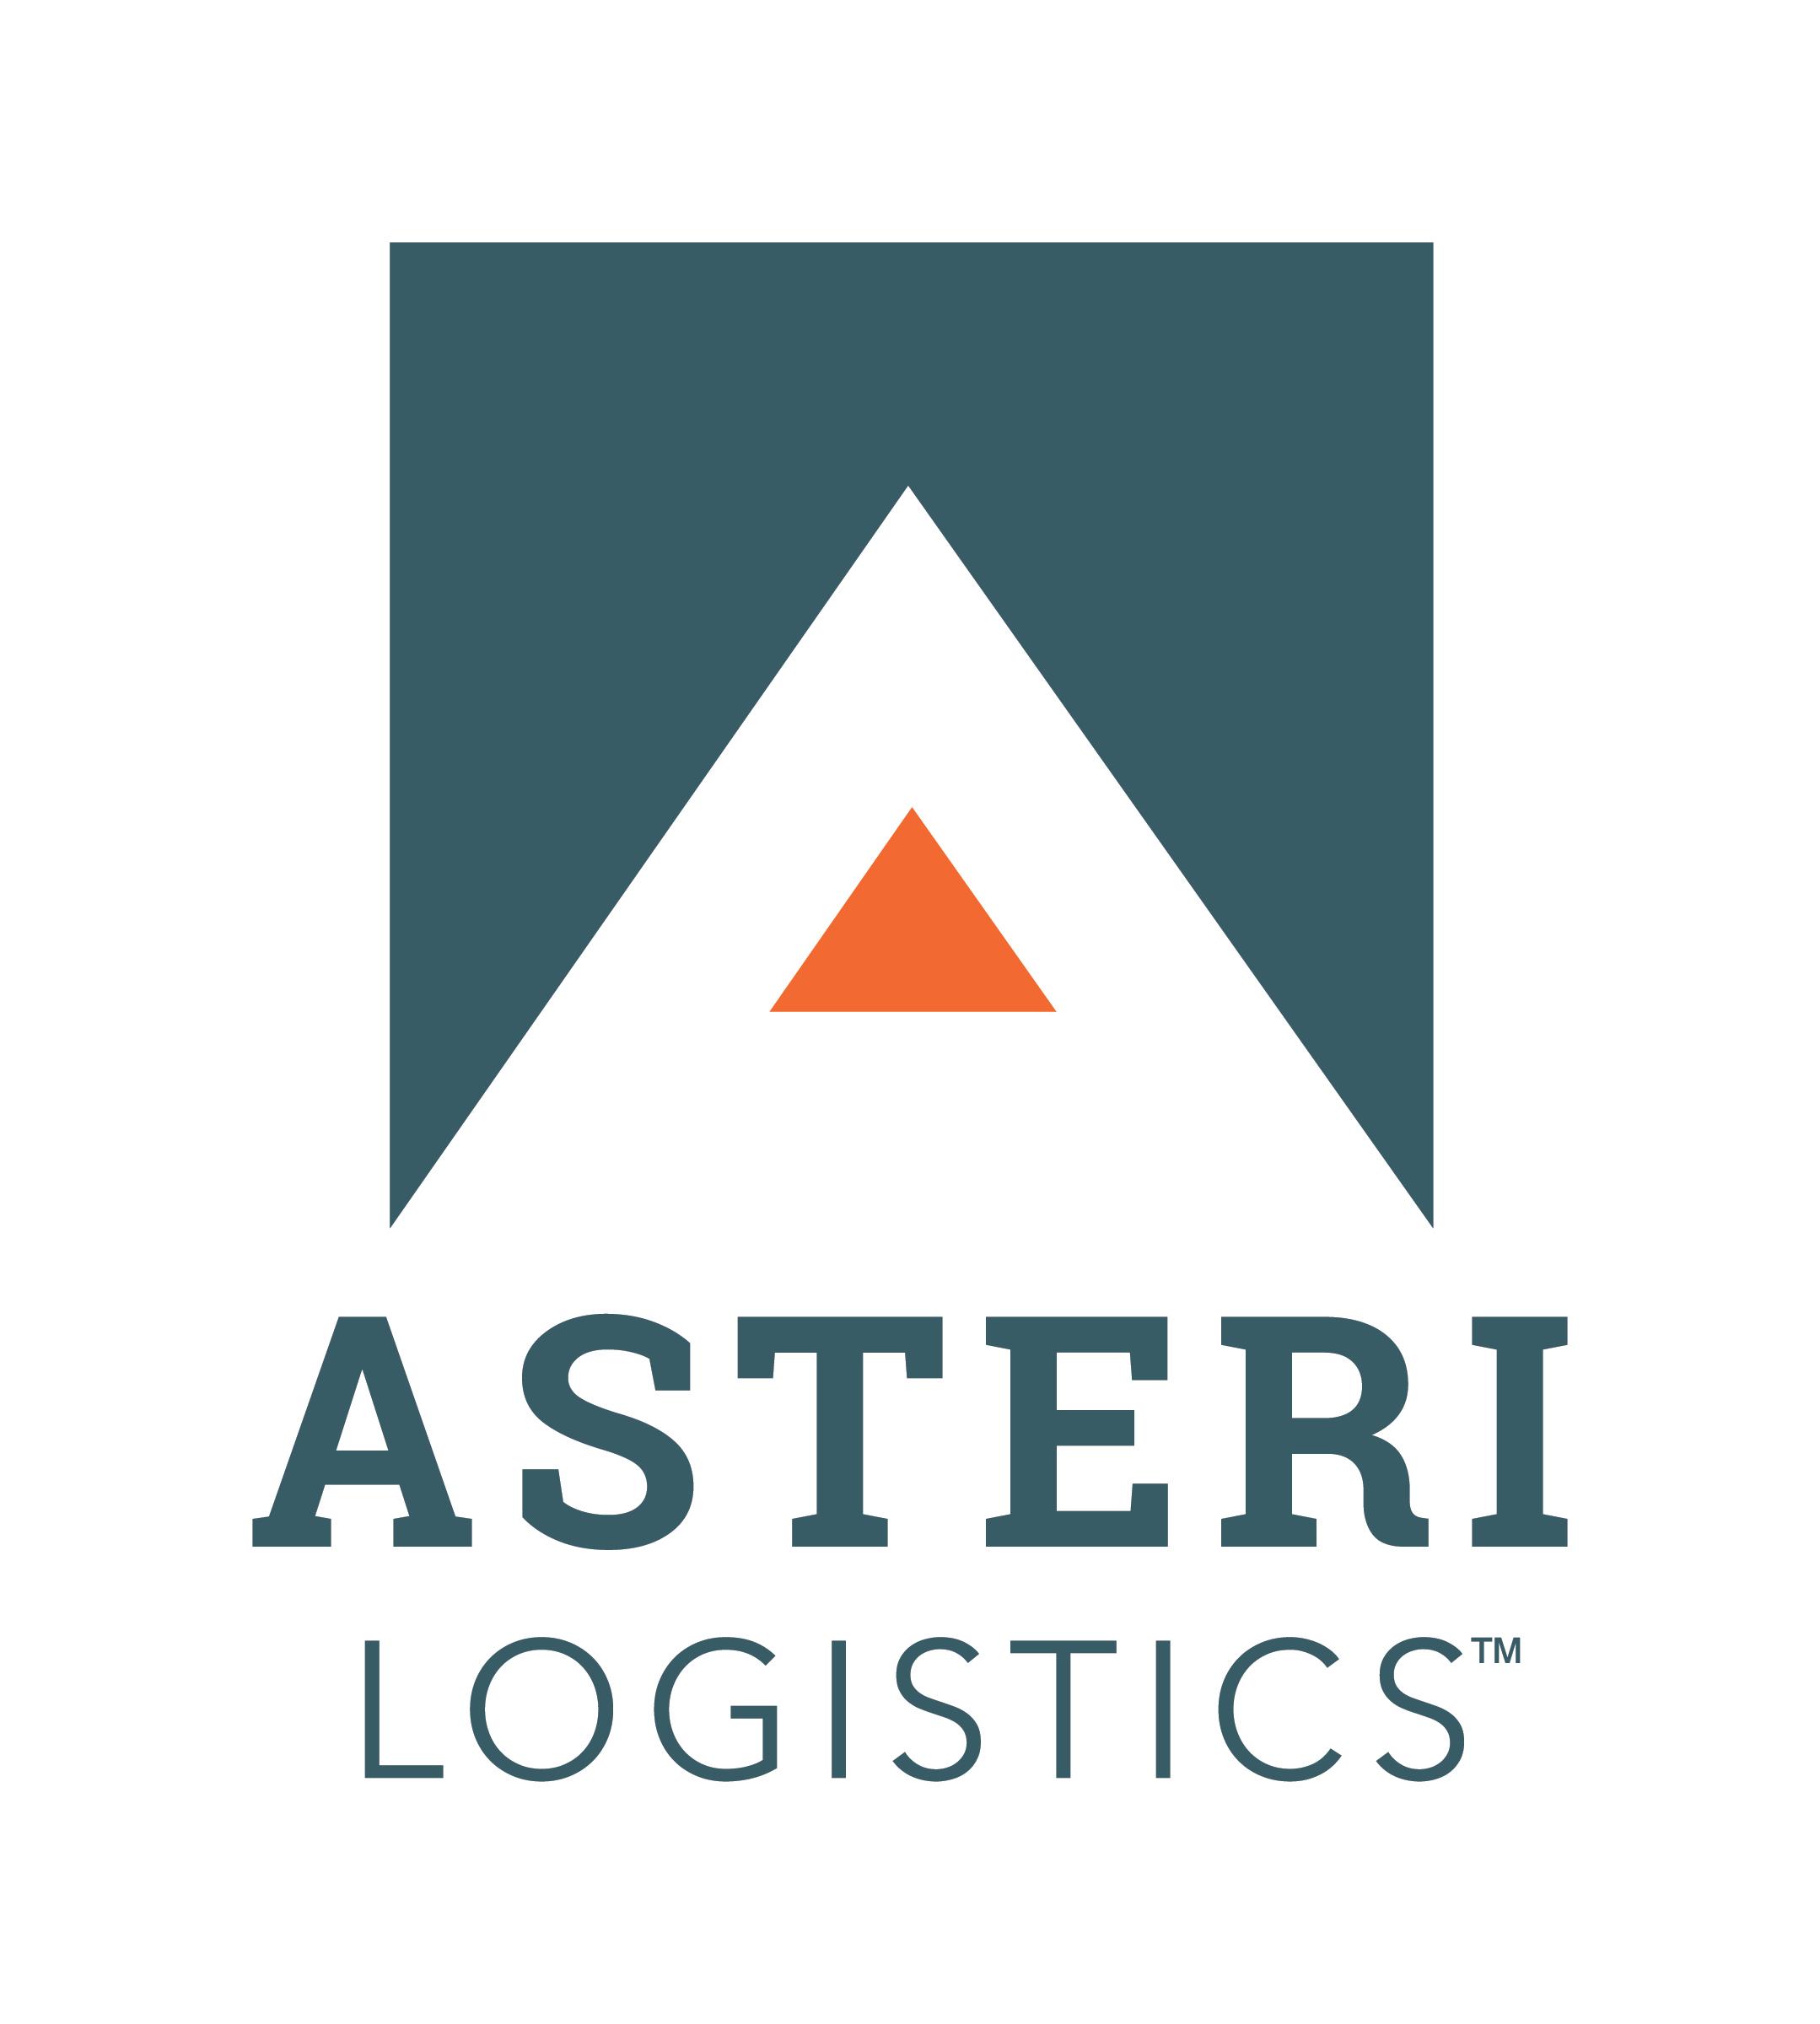 Asteri Logistics logo